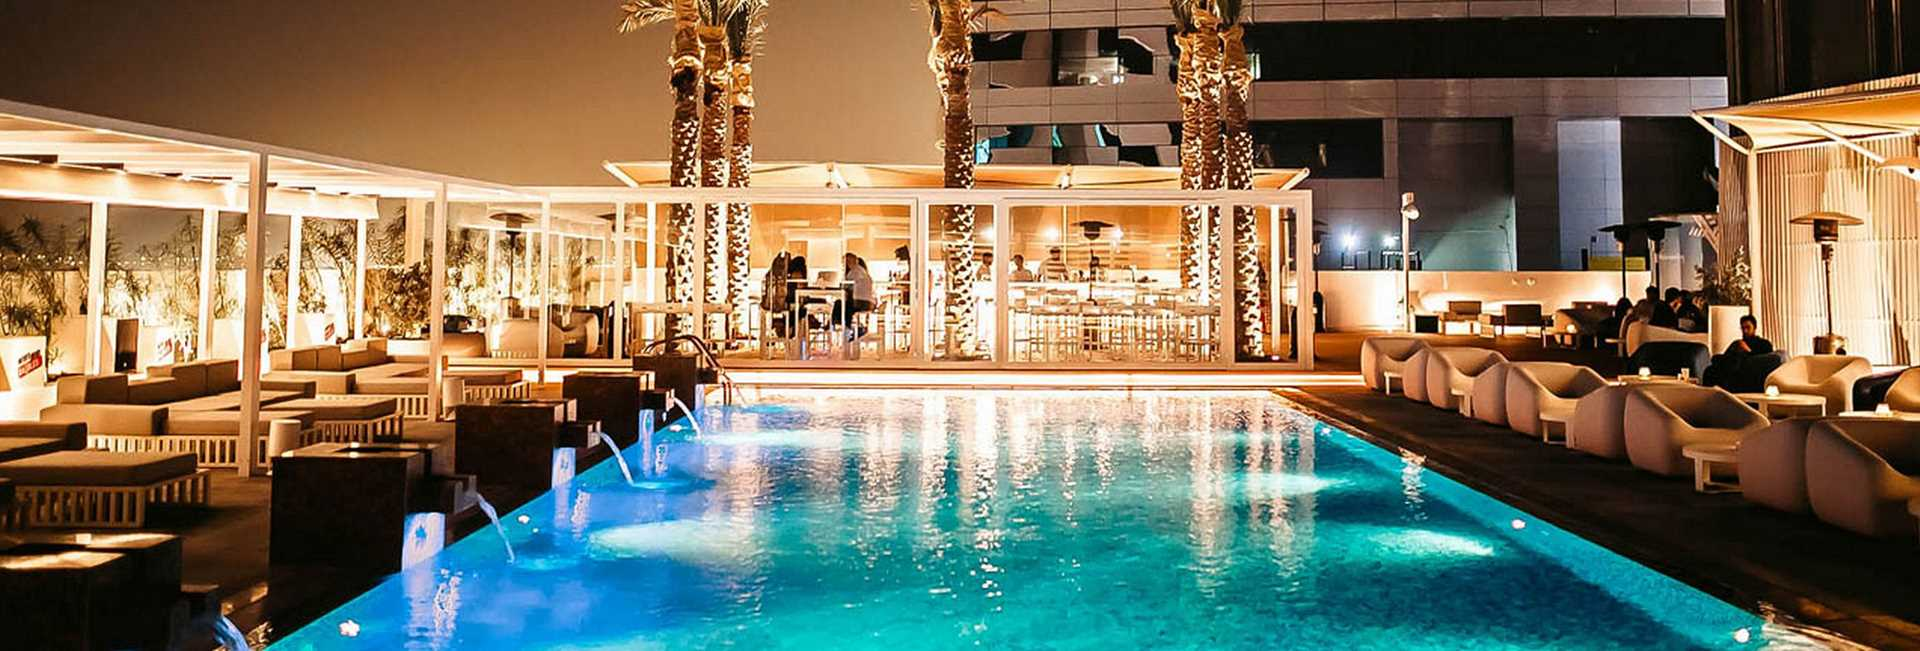 15 Closest Hotels to Jumeirah Beach in Dubai | Hotels.com